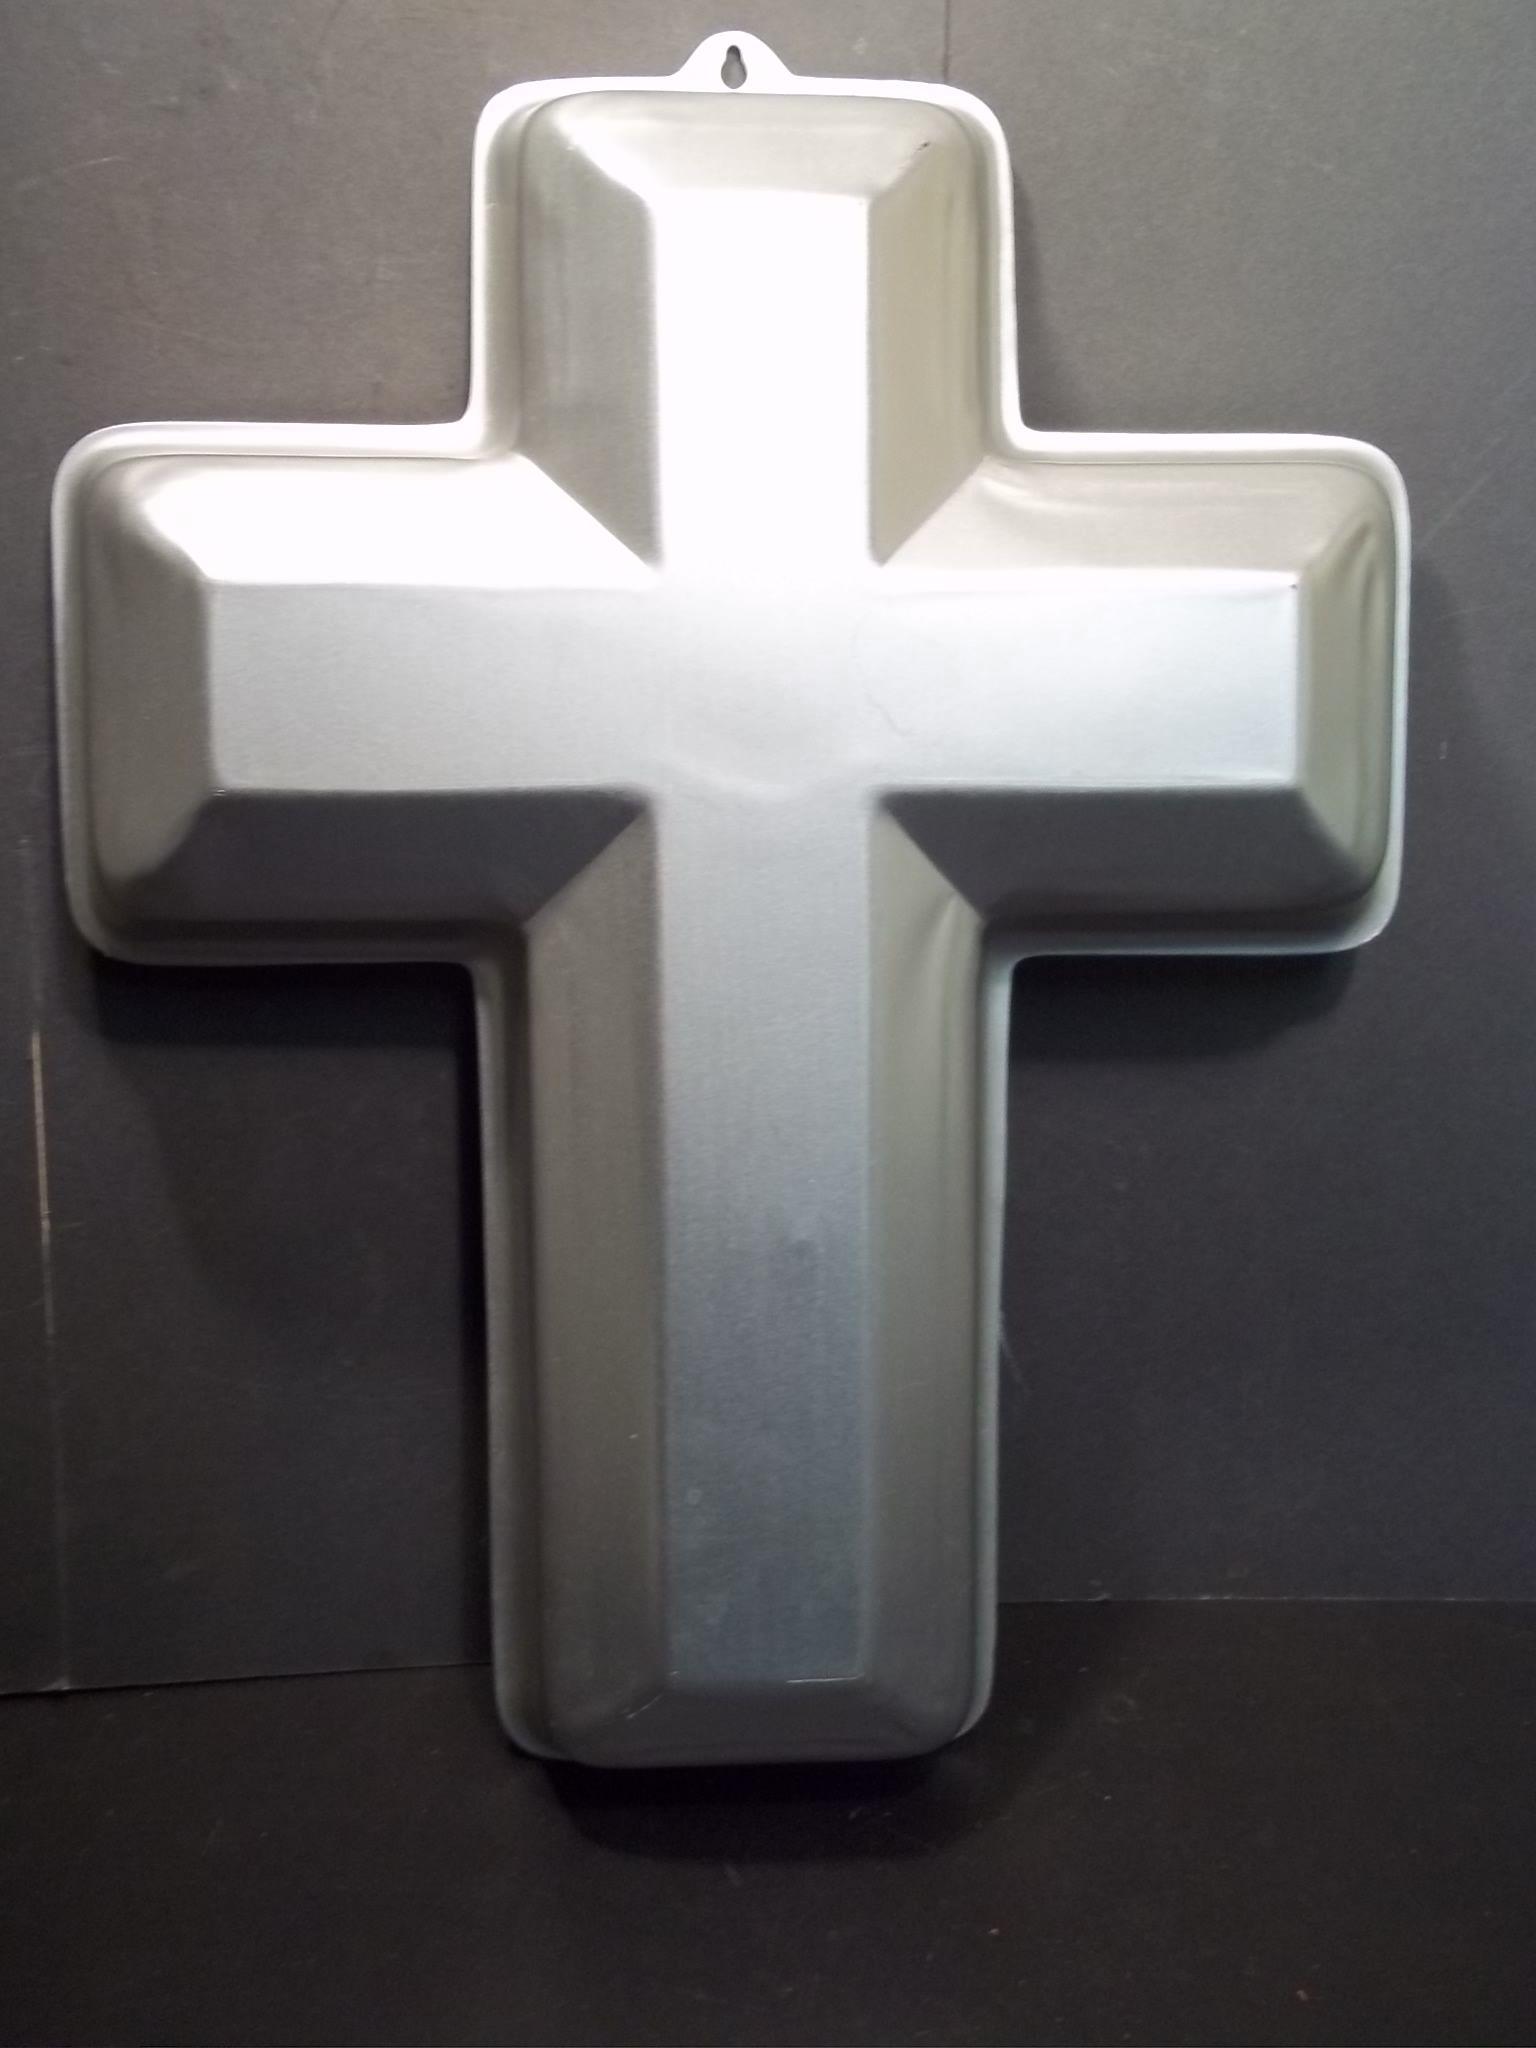 Wilton Large Religious Easter Cross Shape Cake Pan